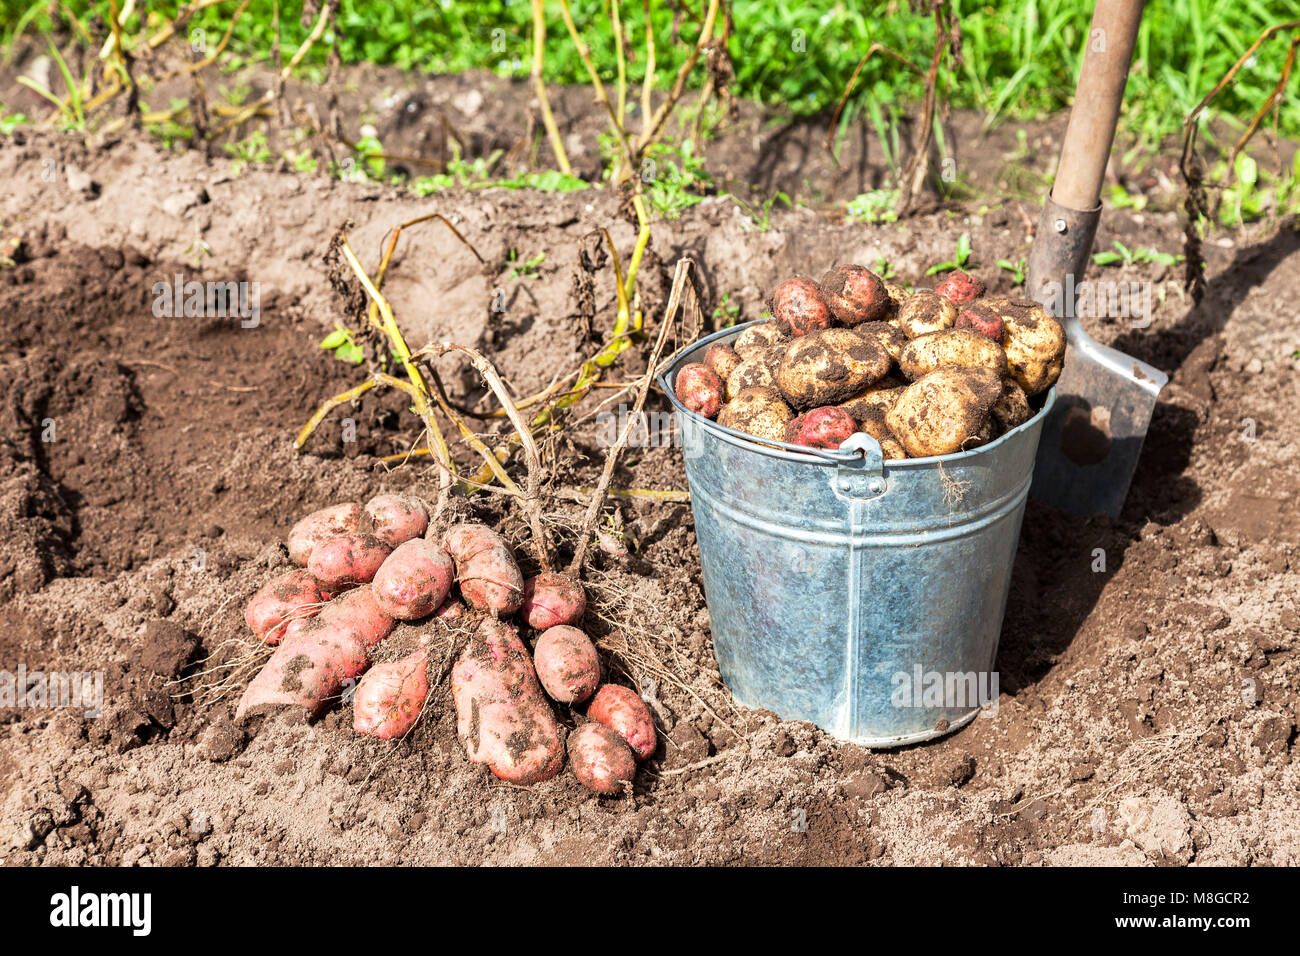 Freshly dug potatoes in metal bucket and shovel at the vegetable ...